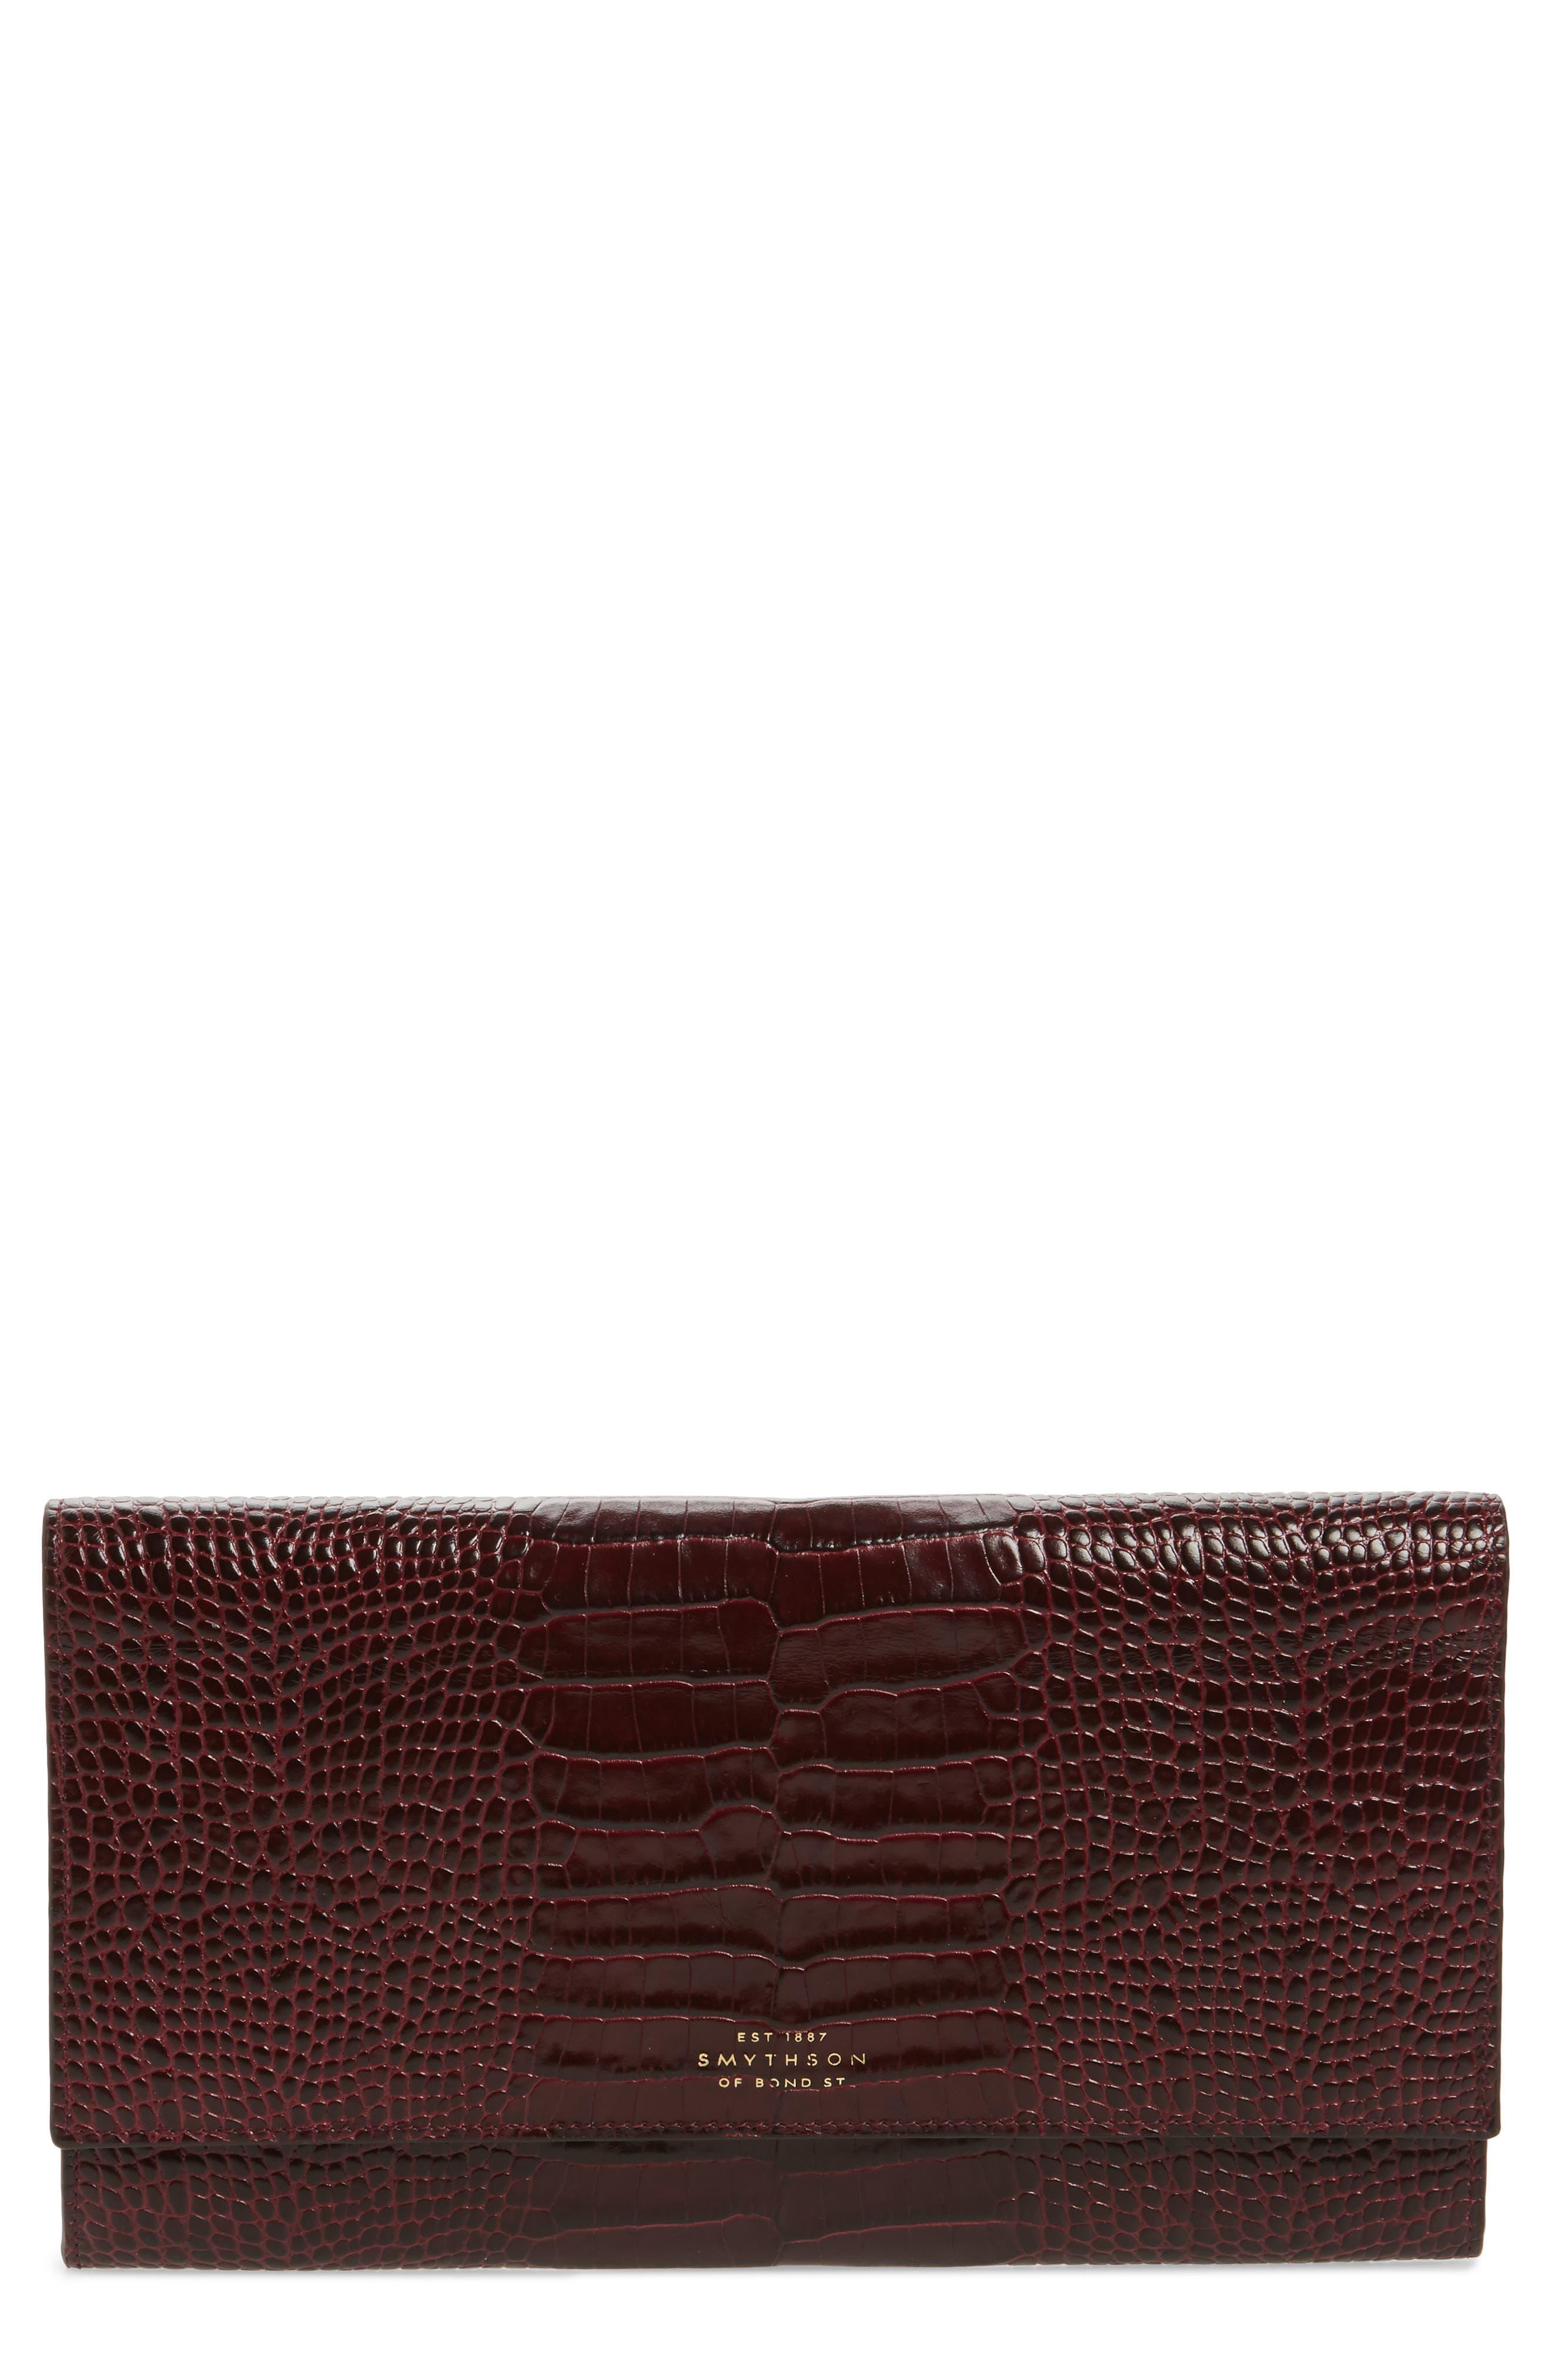 Smythson Mara Marshall Croc Embossed Leather Travel Wallet